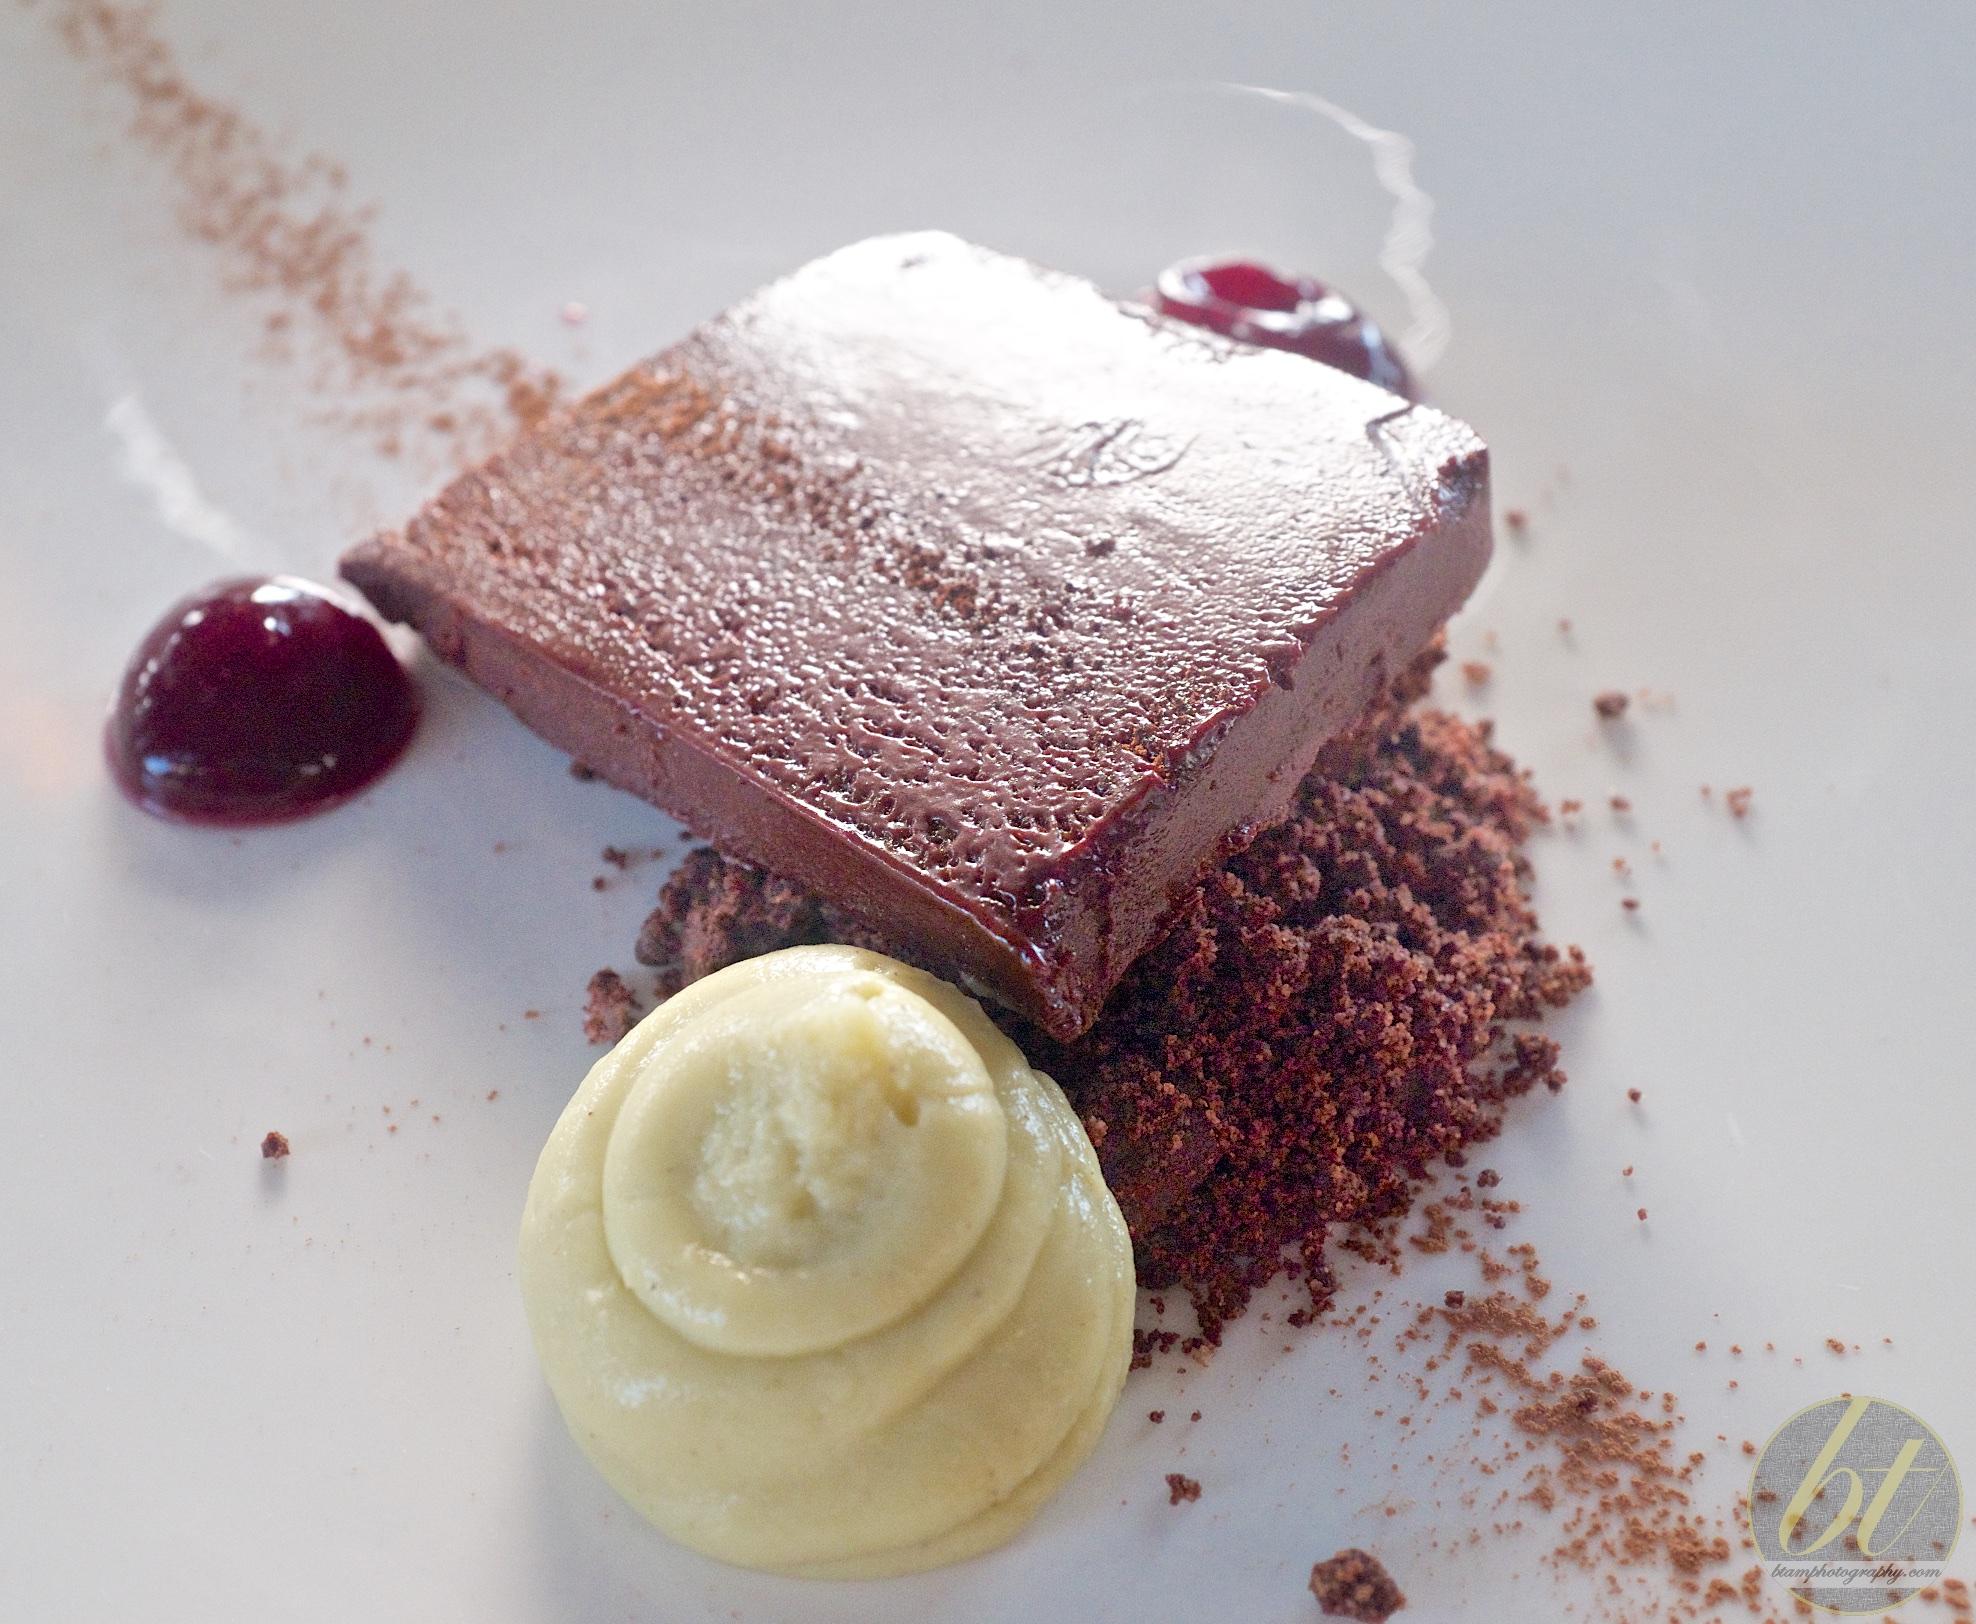 Chocolate marquise, pistachio cream, chocolate crumbs, red wine gel ($15)